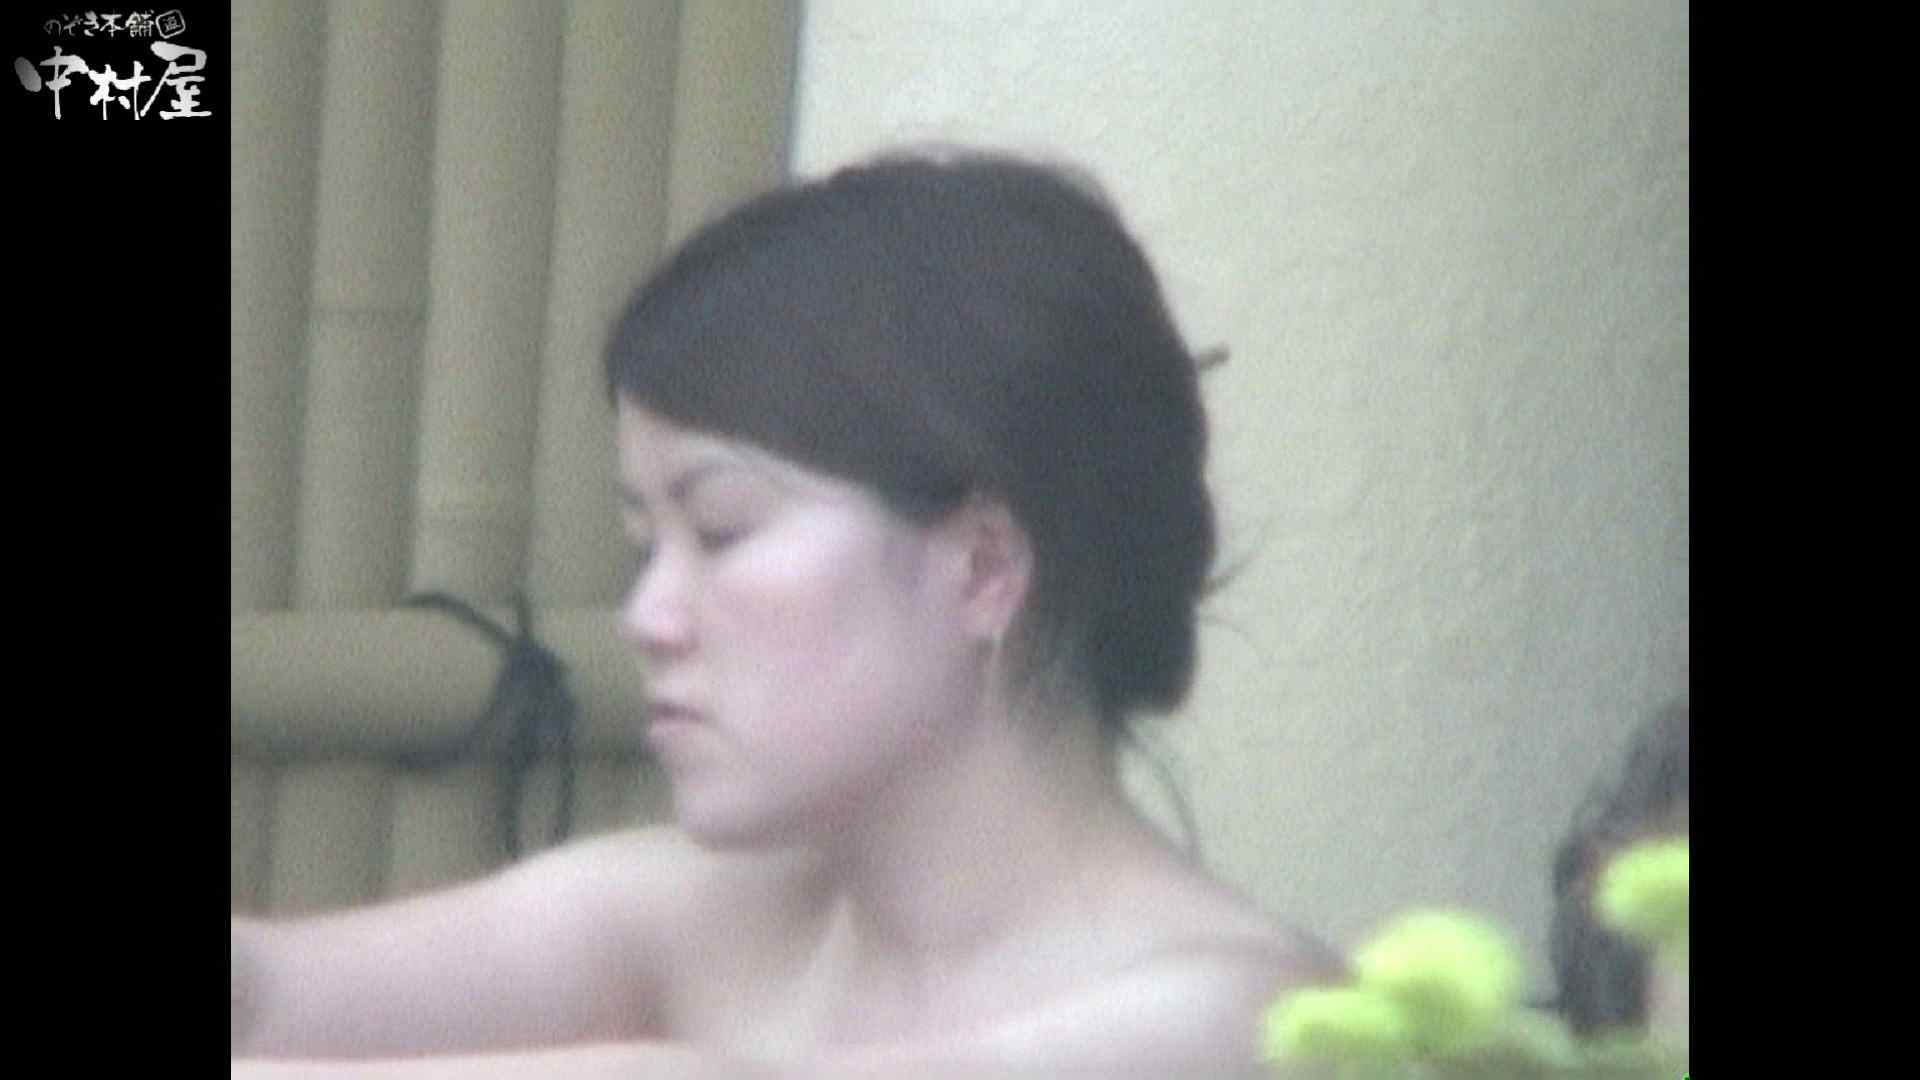 Aquaな露天風呂Vol.935 OLのエロ生活 性交動画流出 32連発 29